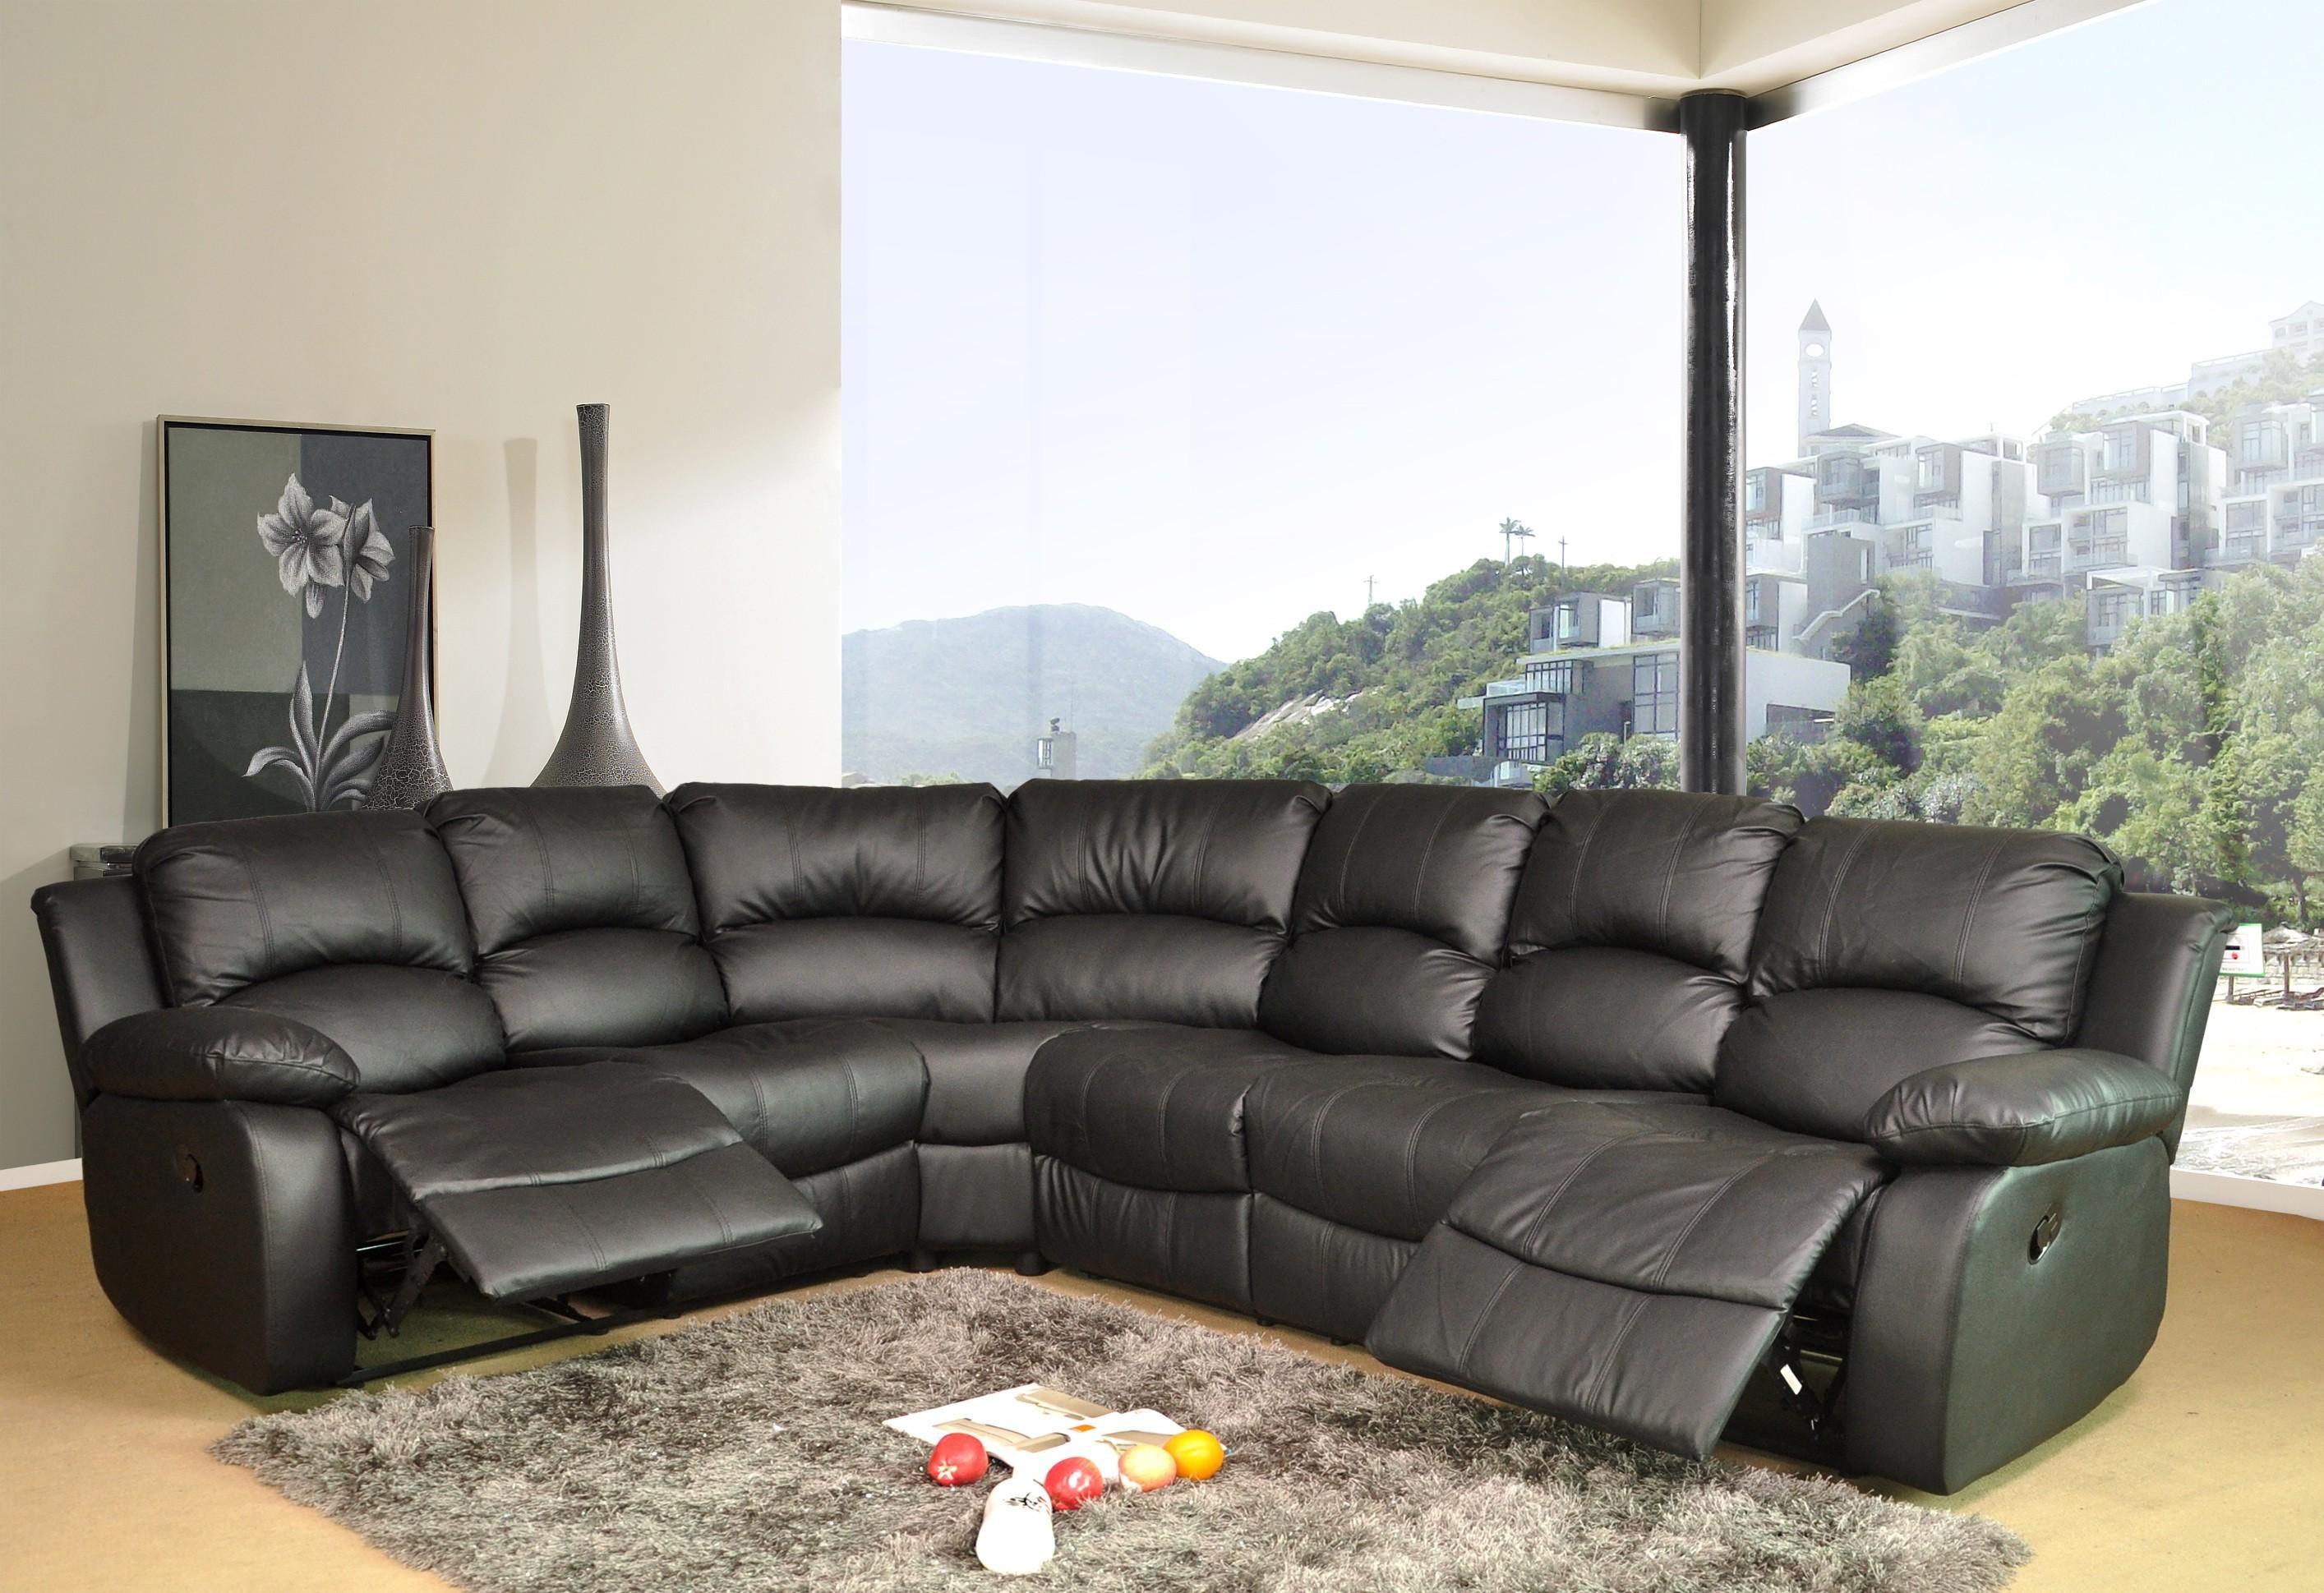 Black Leather Corner Sofa | Sofa Gallery | Kengire Inside Black Corner Sofas (View 4 of 20)